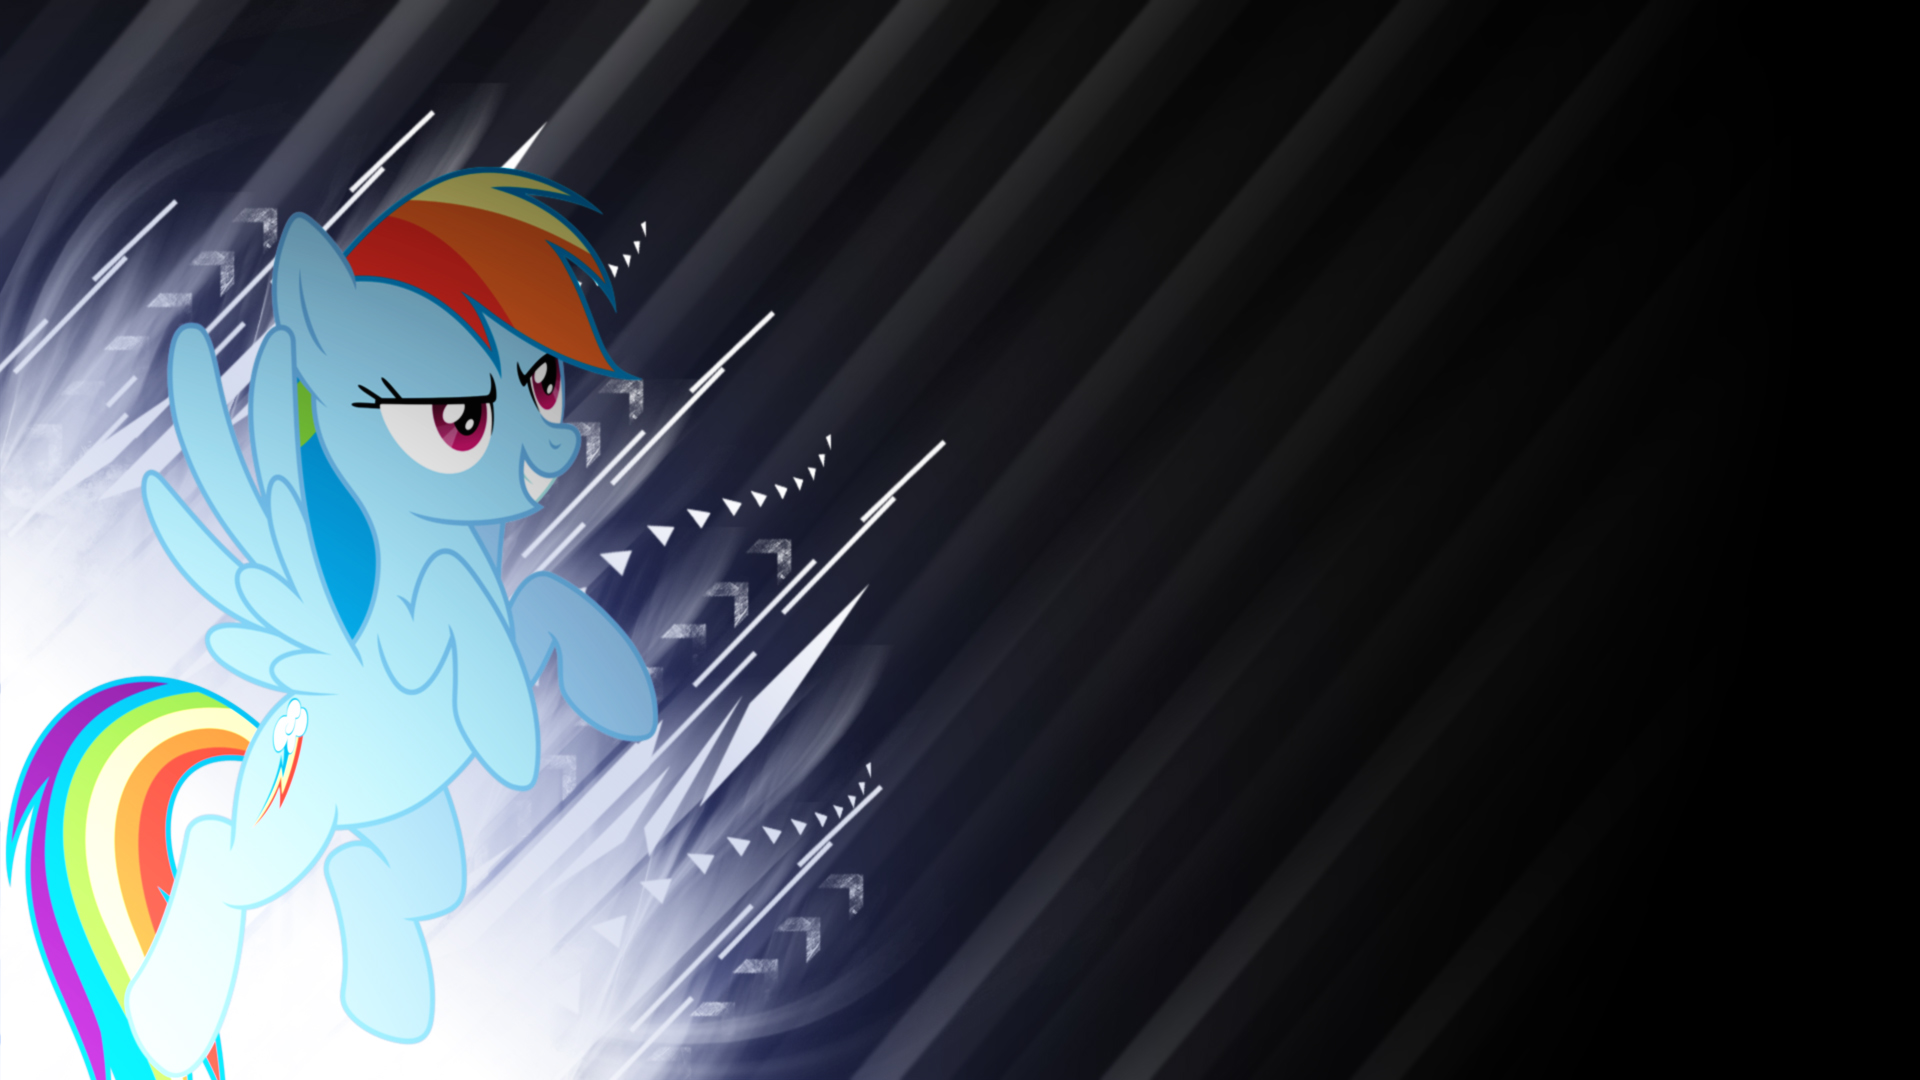 Rainbow Dash grunge background by BronyYAY123 and Hawk9mm